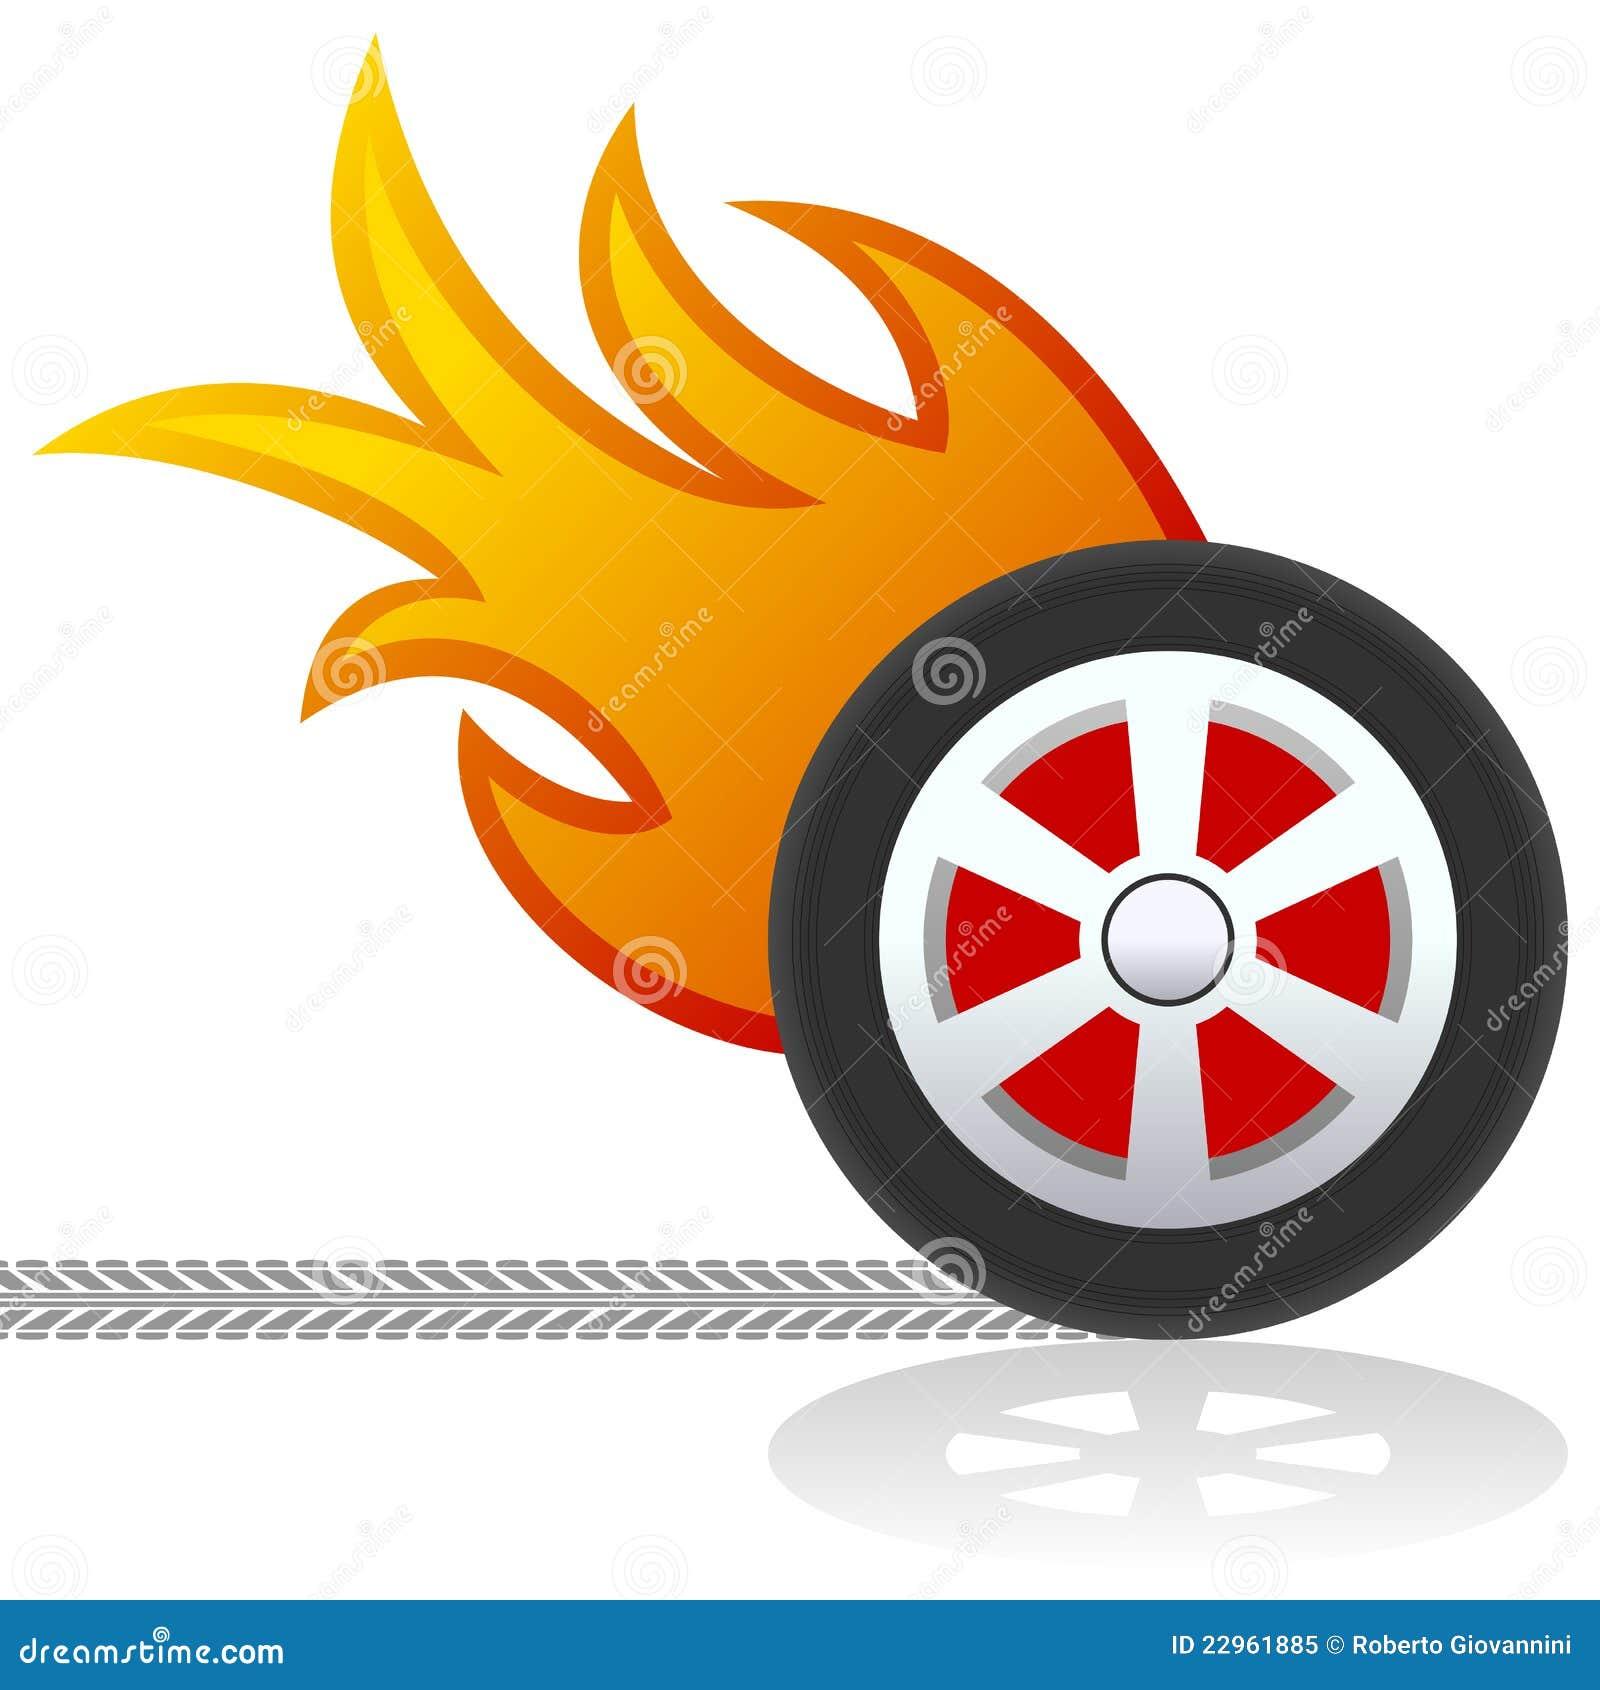 Car Wheel Flames Stock Illustrations 376 Car Wheel Flames Stock Illustrations Vectors Clipart Dreamstime